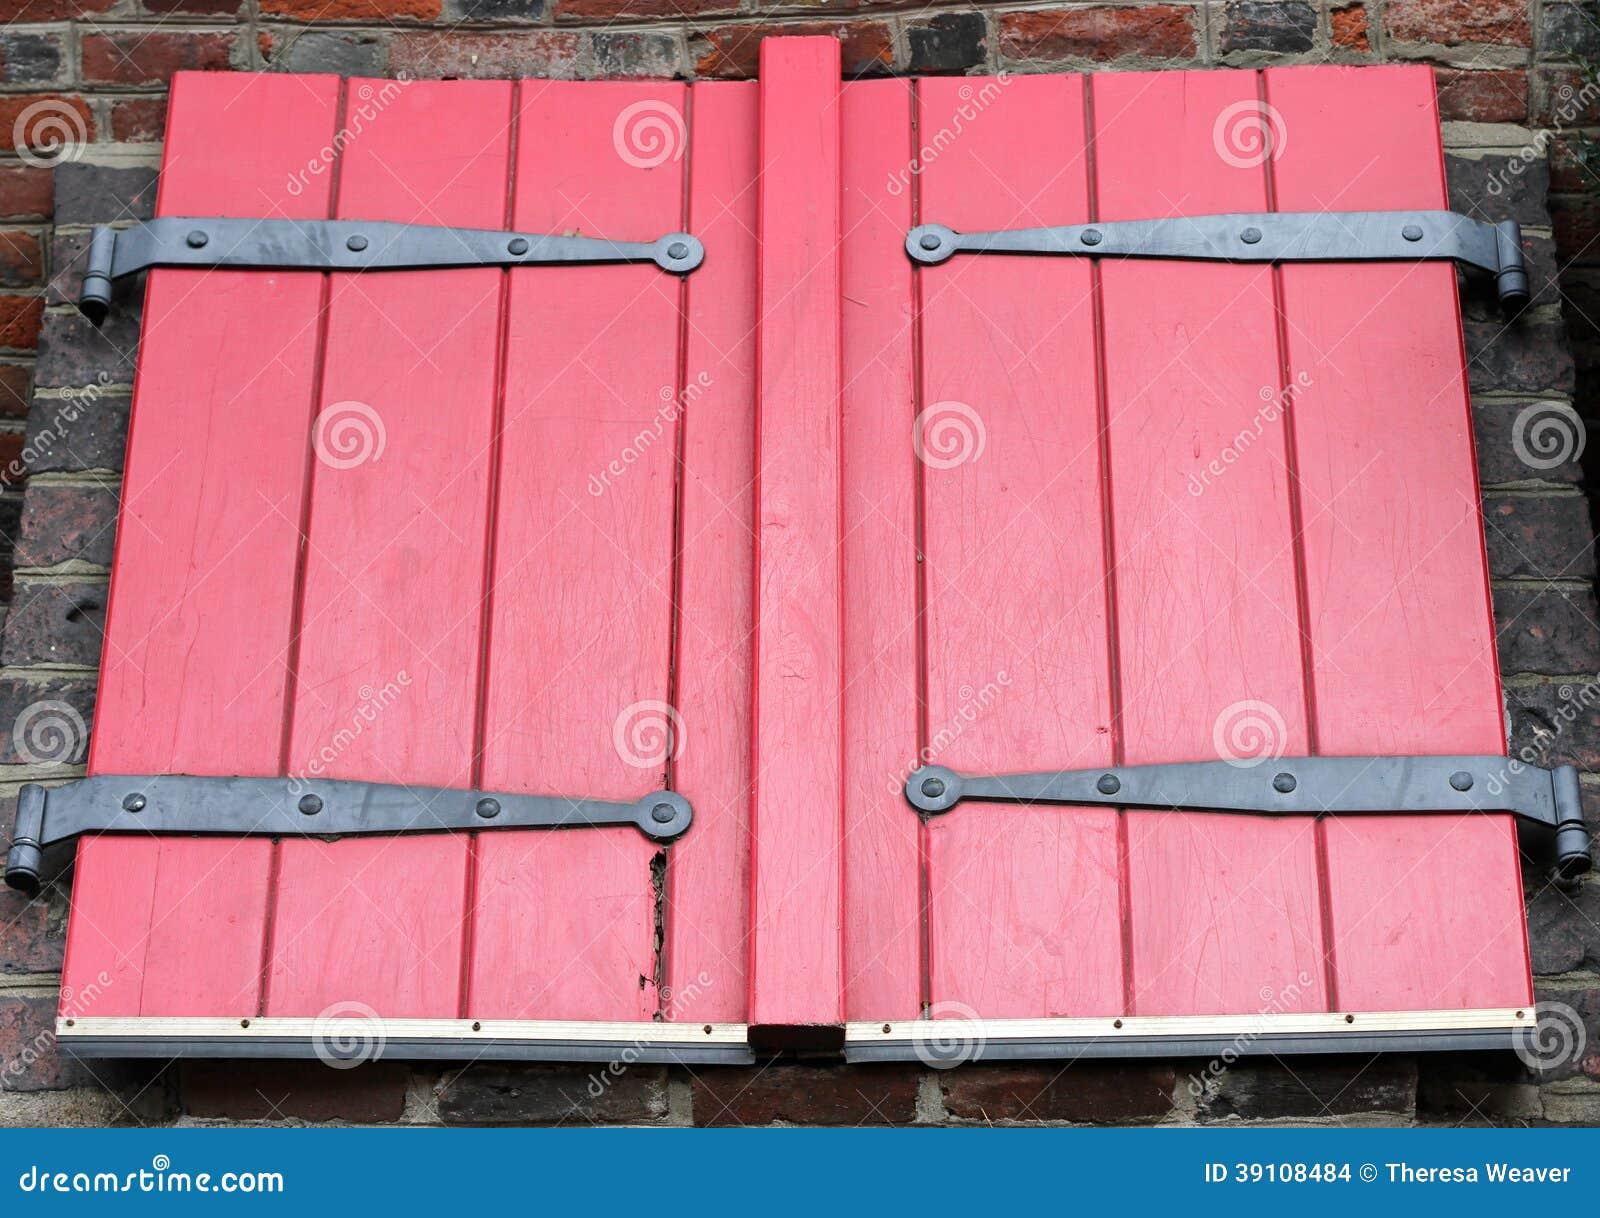 Basement Cellar Doors & Basement Cellar Doors stock photo. Image of private entry - 39108484